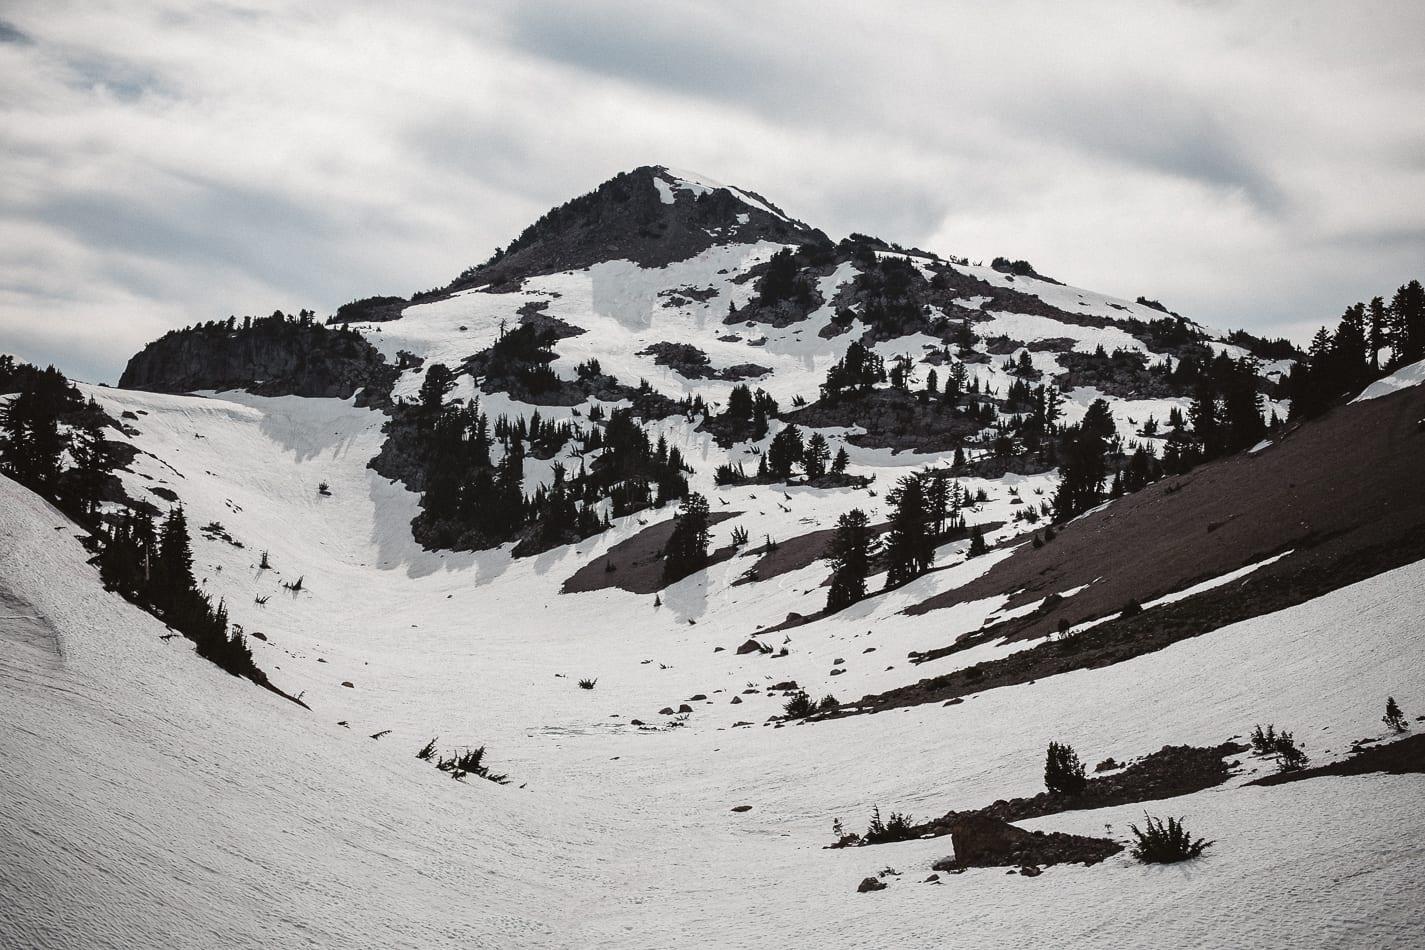 mount-lassen-california-adventure-lifestyle-photorapher-14